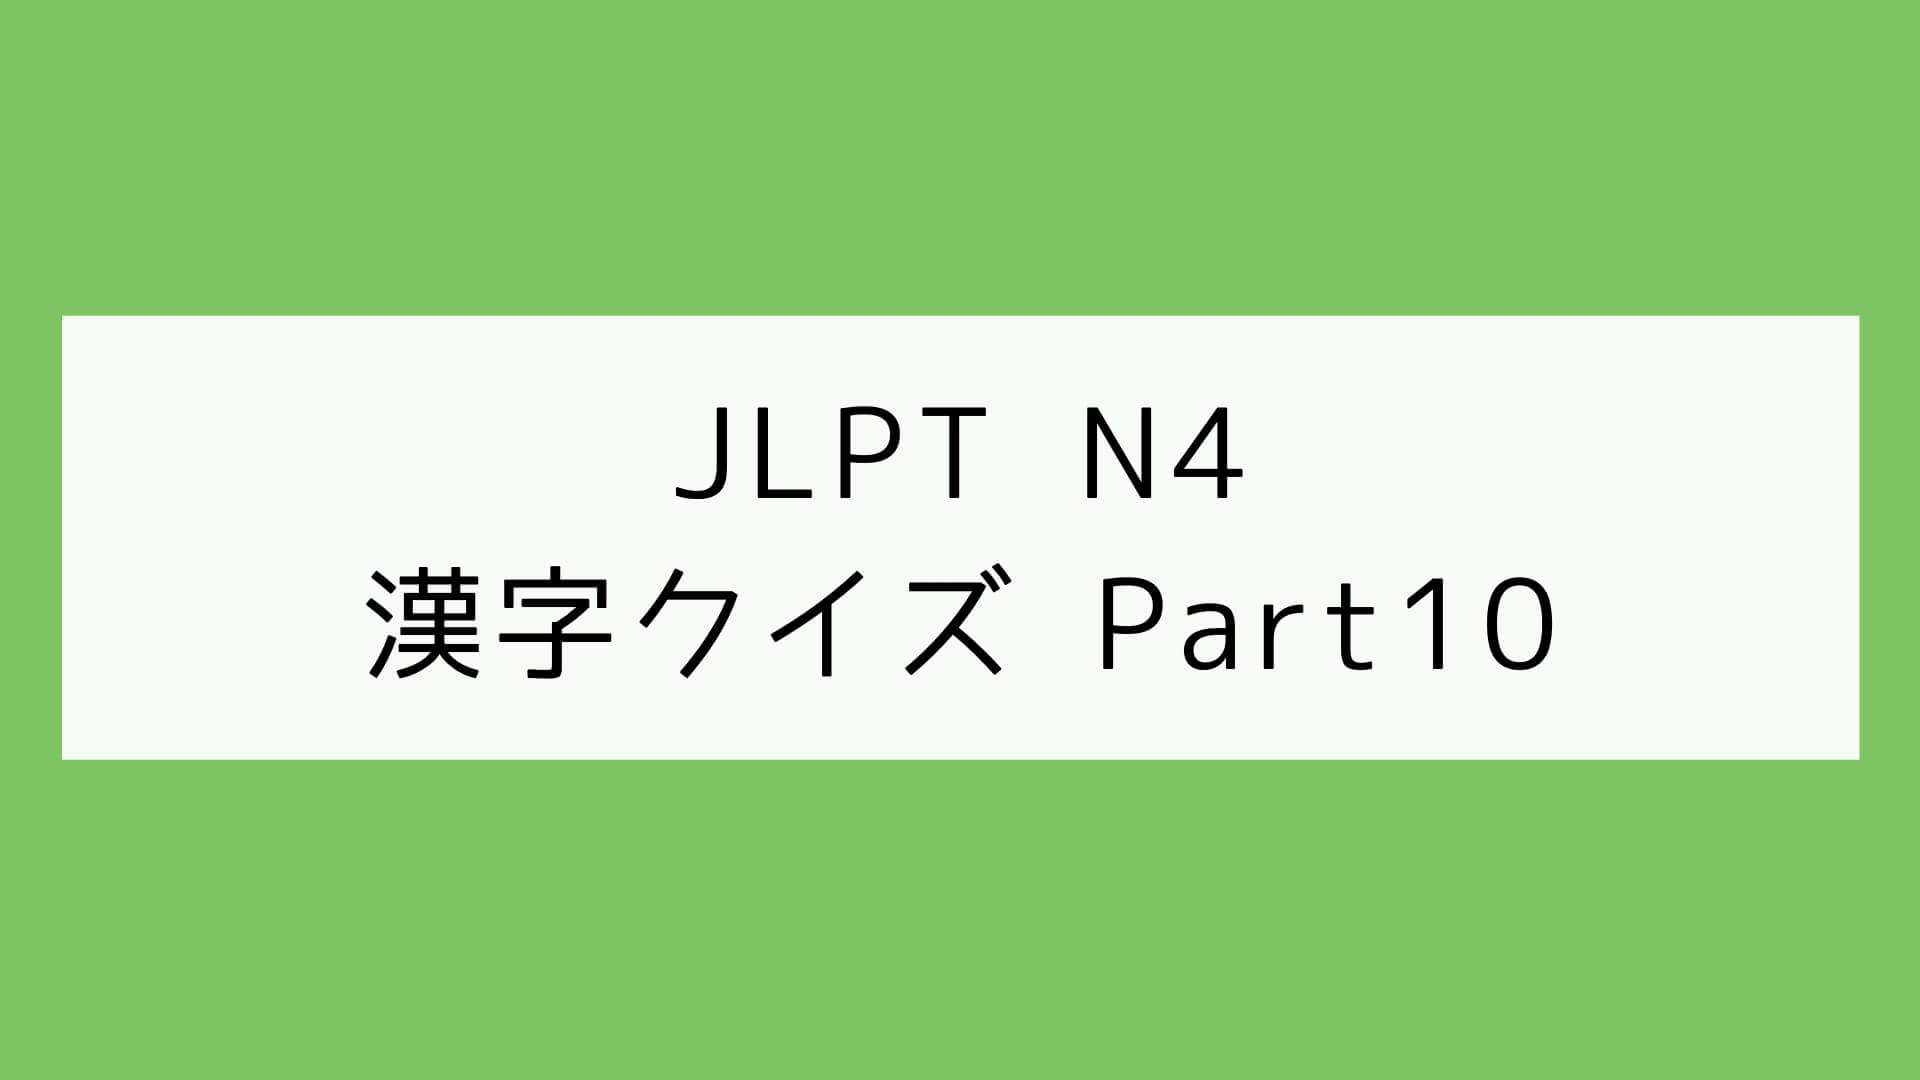 【JLPT N4】漢字クイズ Part10